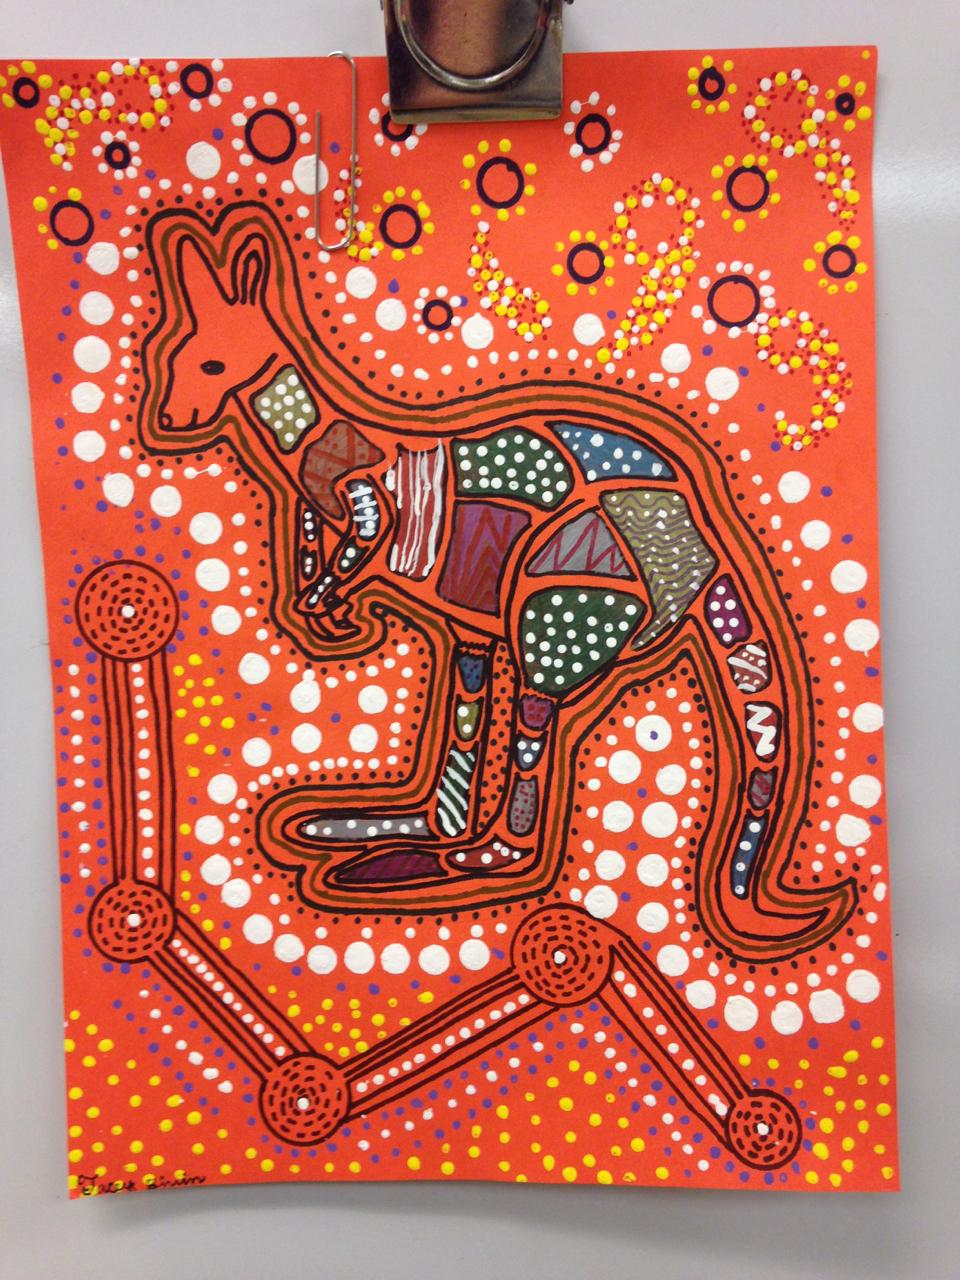 jeanne aird u0026 39 s art fabric and quilts  inspiration from australian aboriginal art